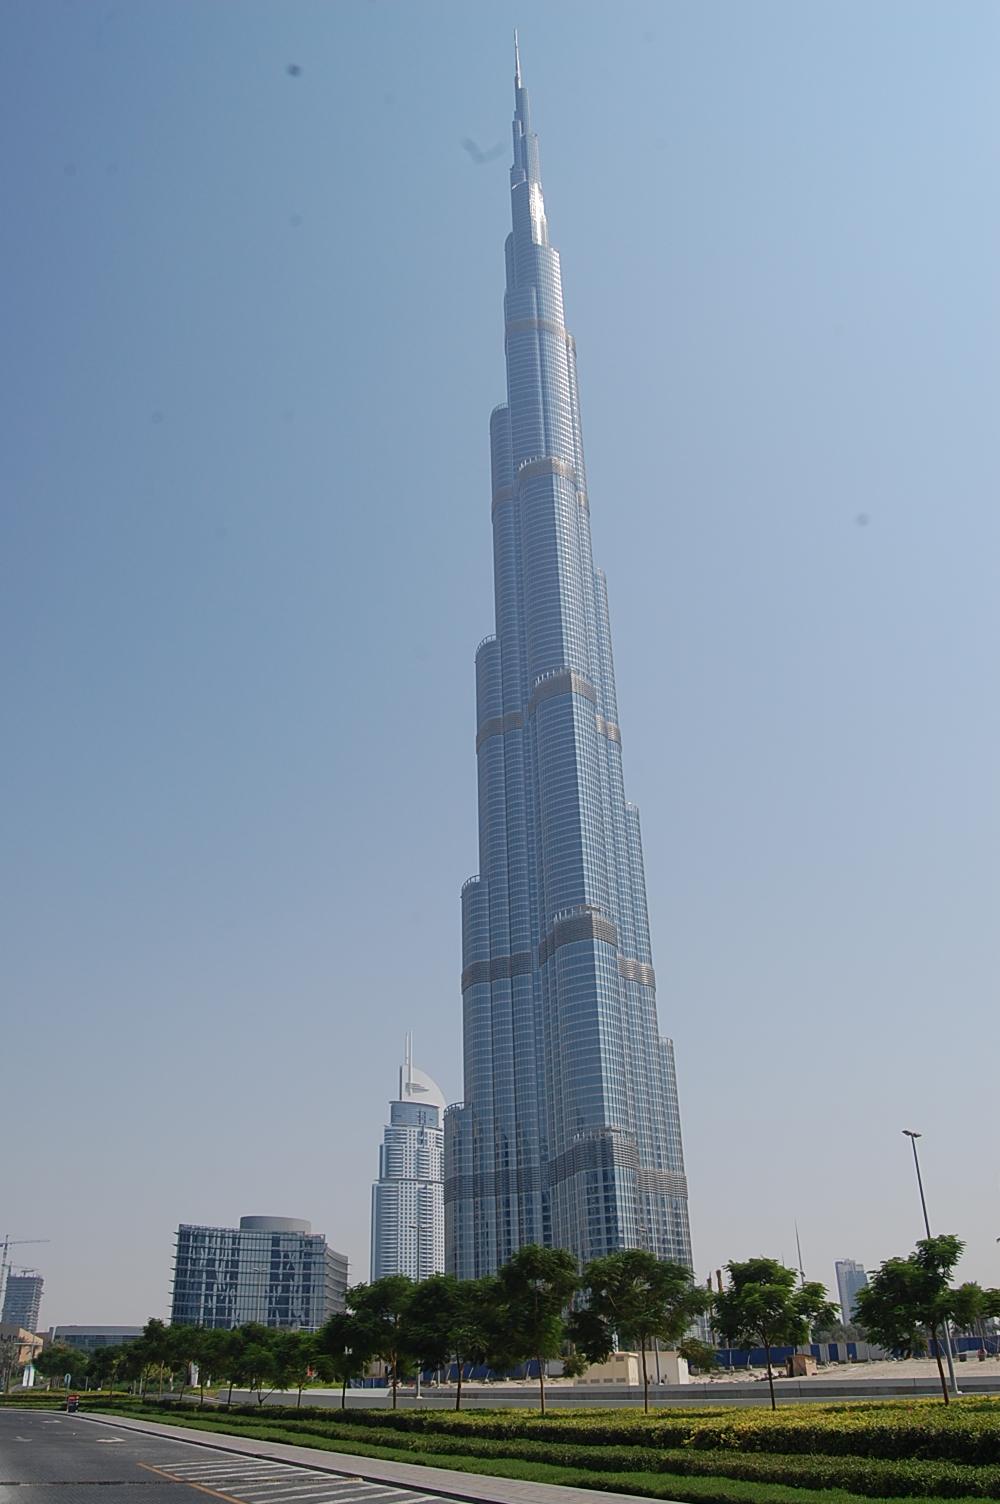 Burj Khalifa Dubai Photo Oye Dino Magkasi 7 Dubaicreektower